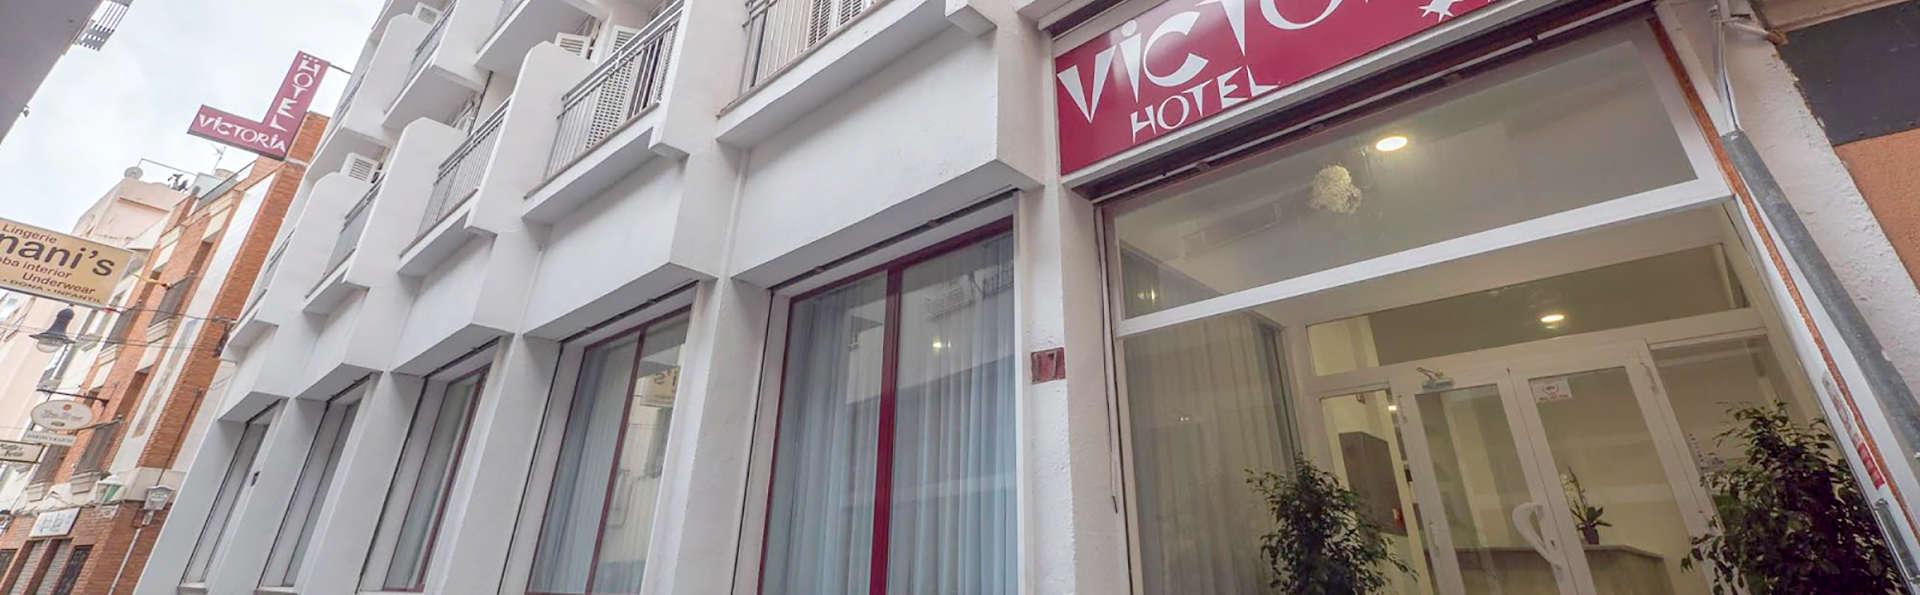 Hotel Victoria - Edit_Front.jpg